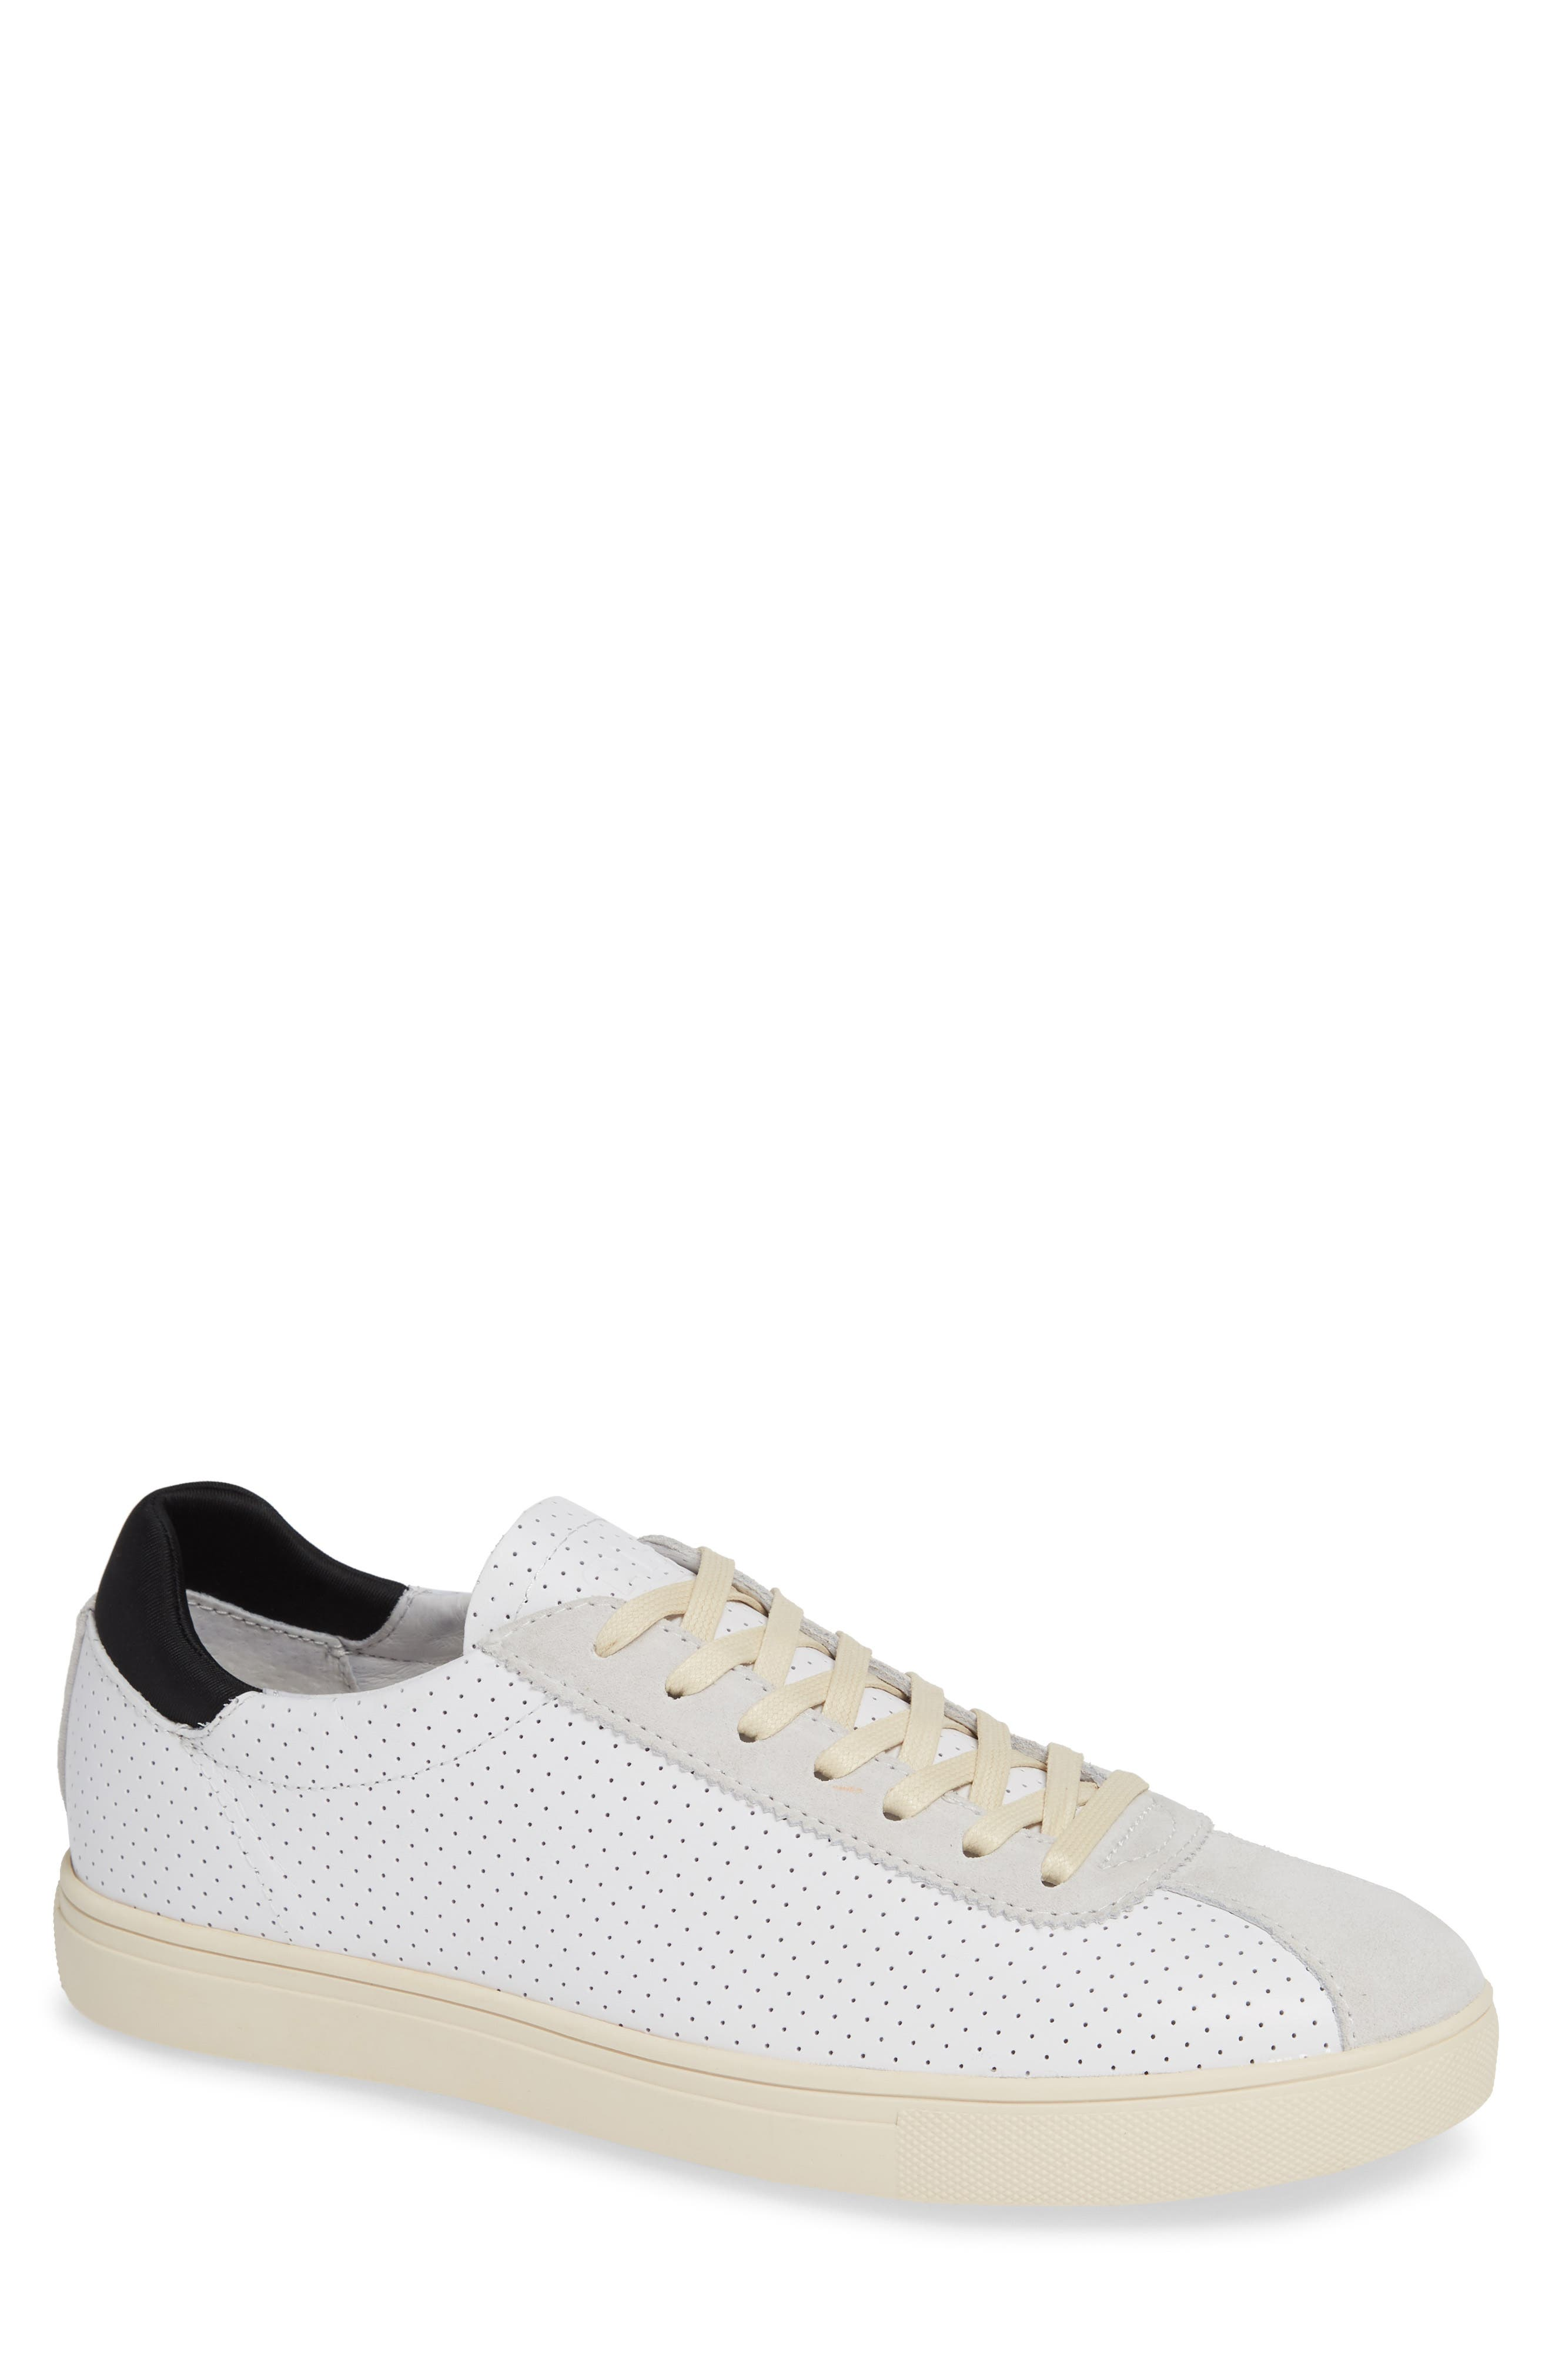 Noah Sneaker,                         Main,                         color, WHITE LEATHER SUEDE CREAM